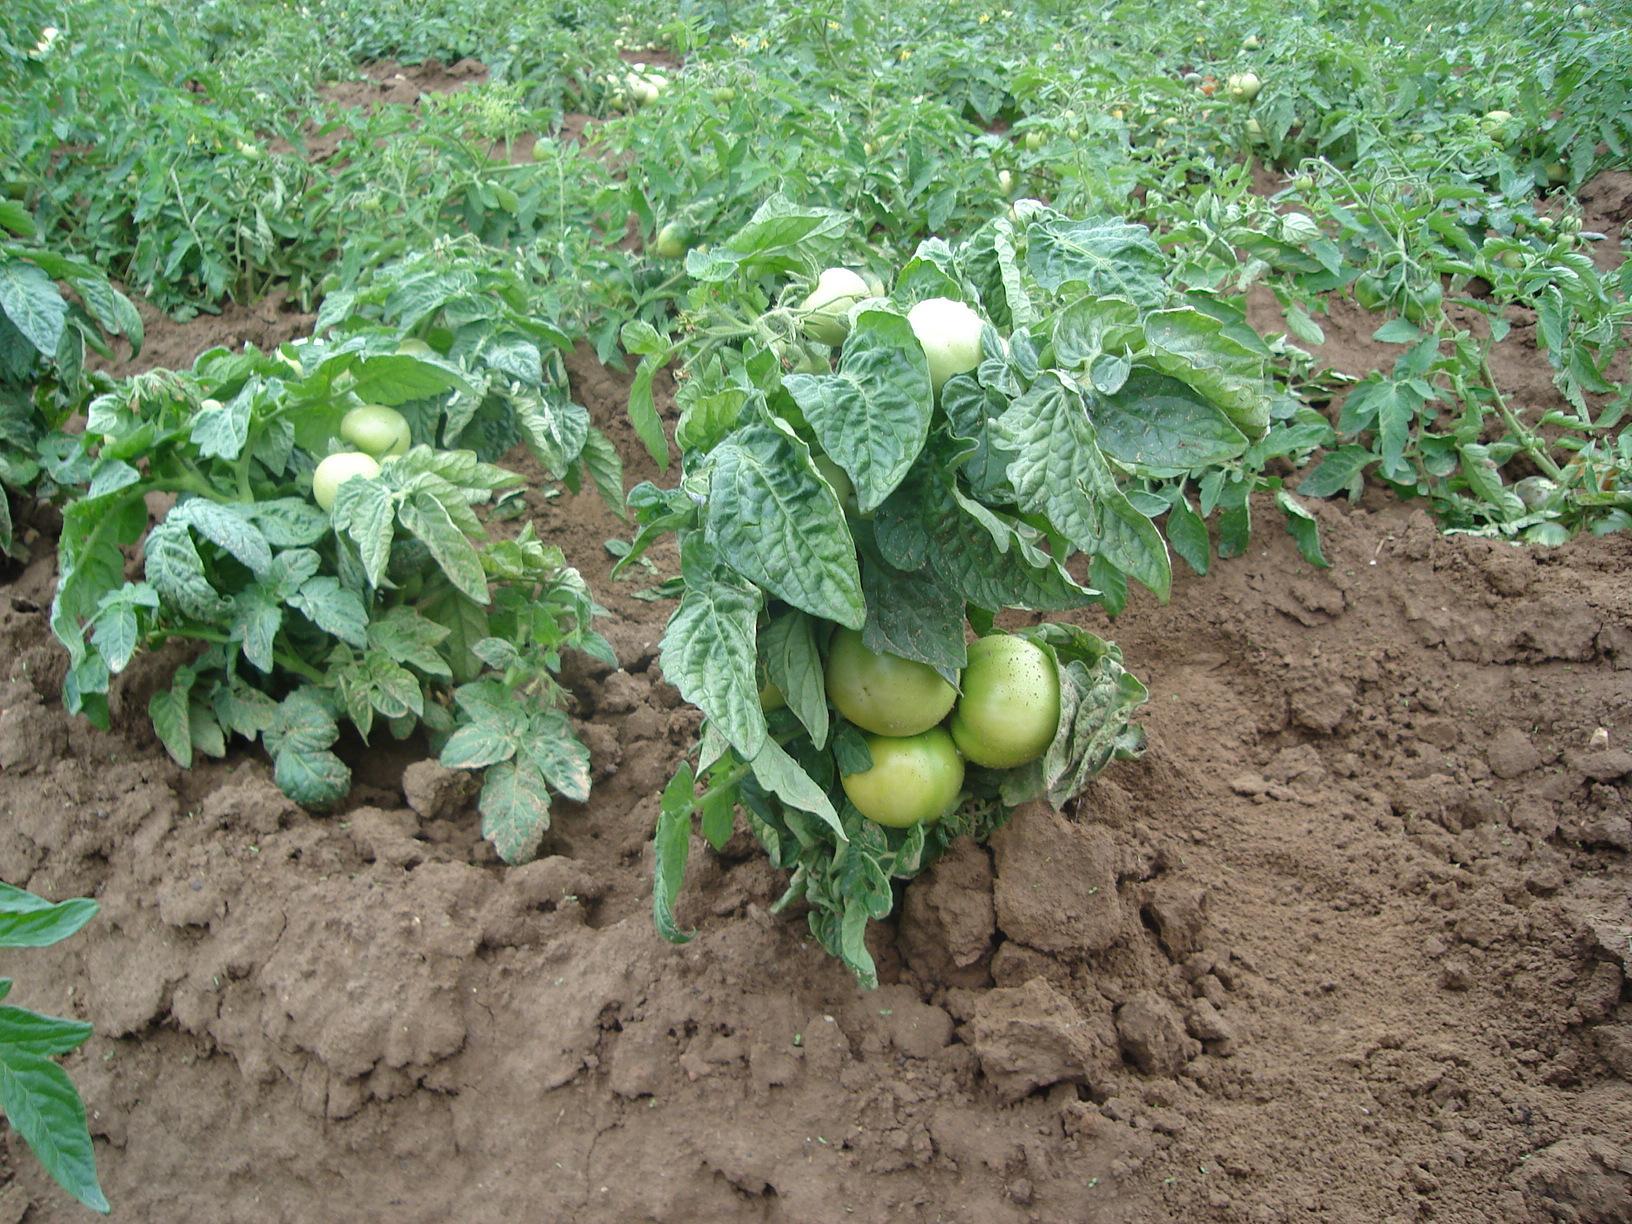 Штамбовый сорт помидор - низкорослые томаты